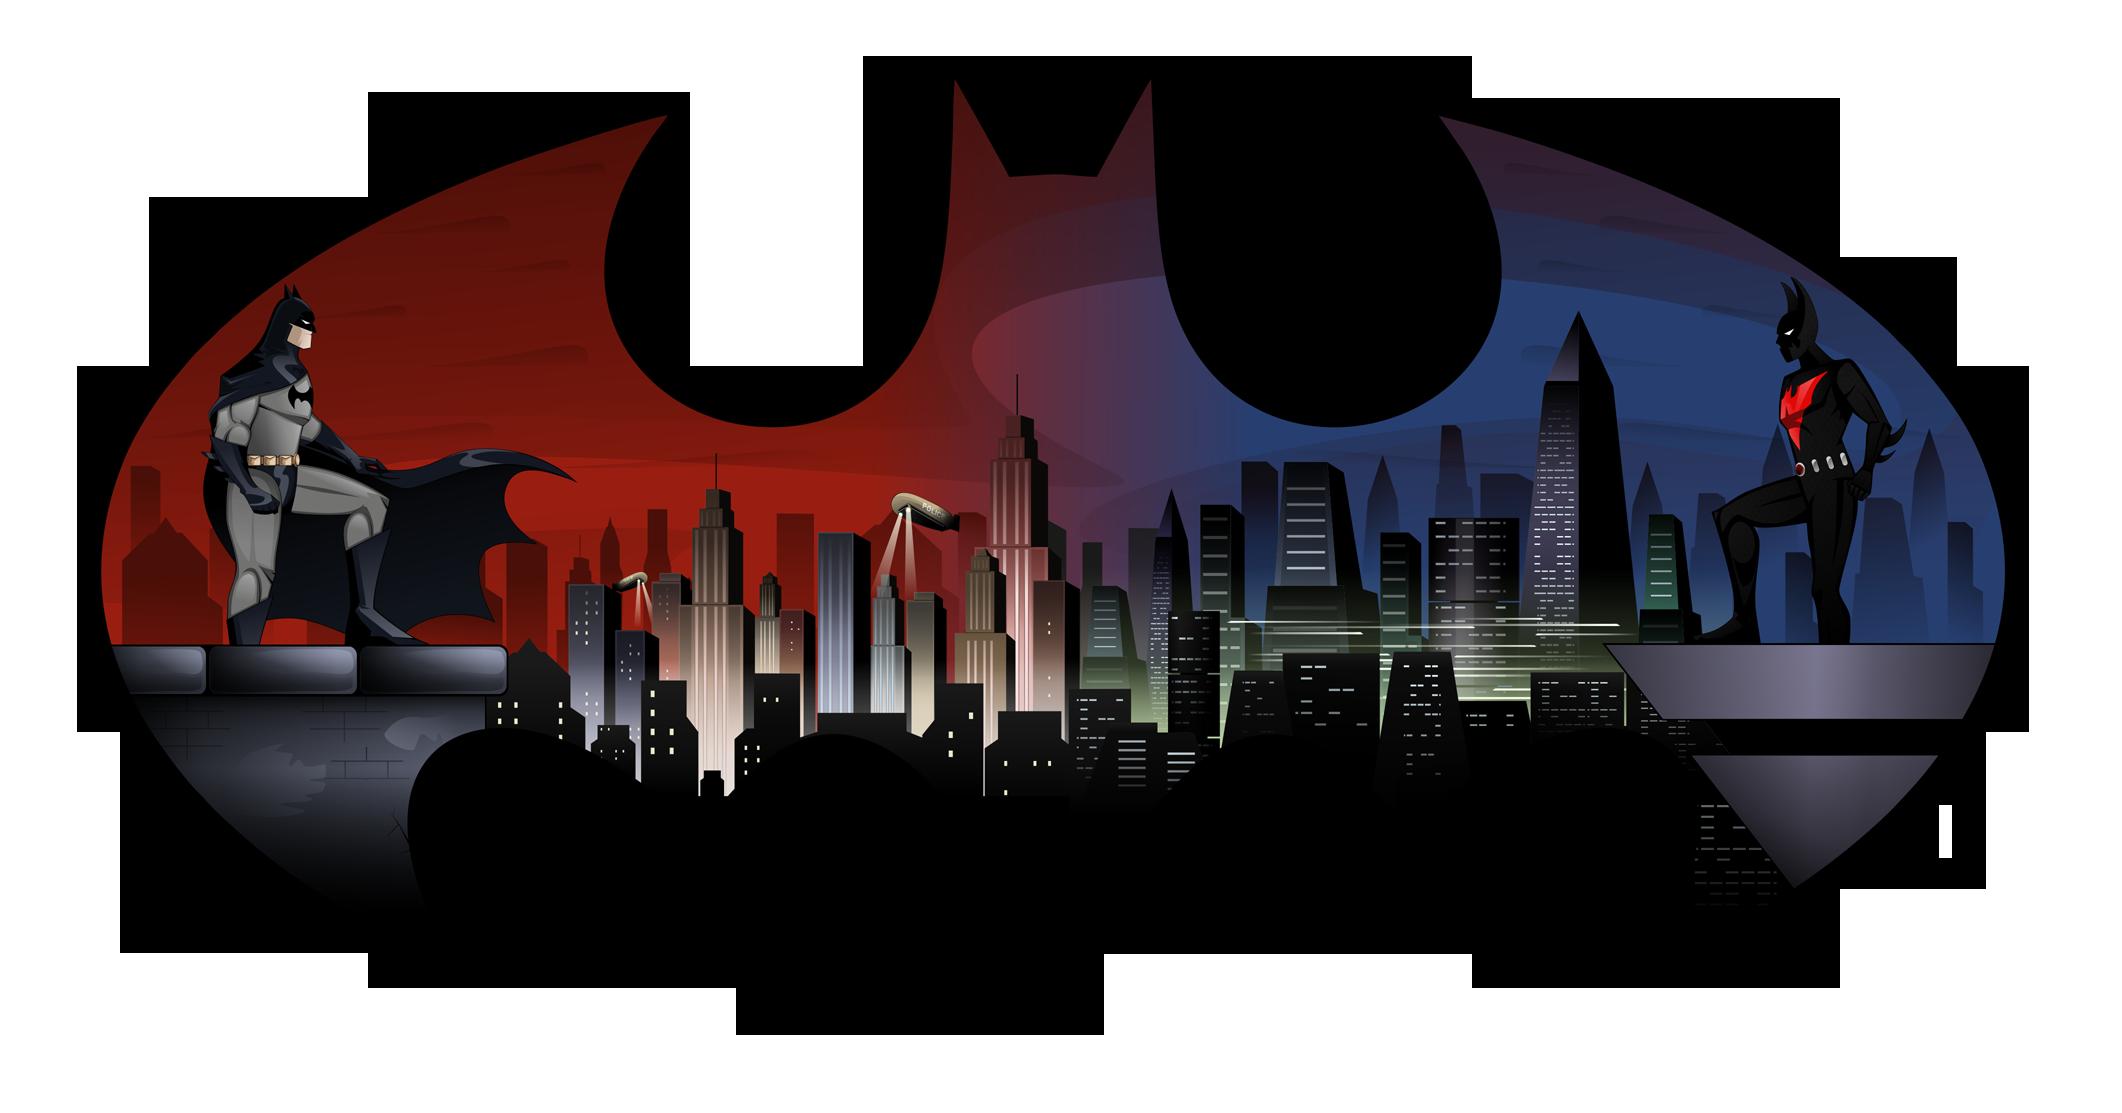 Batman project by nemesisdestrodareal1